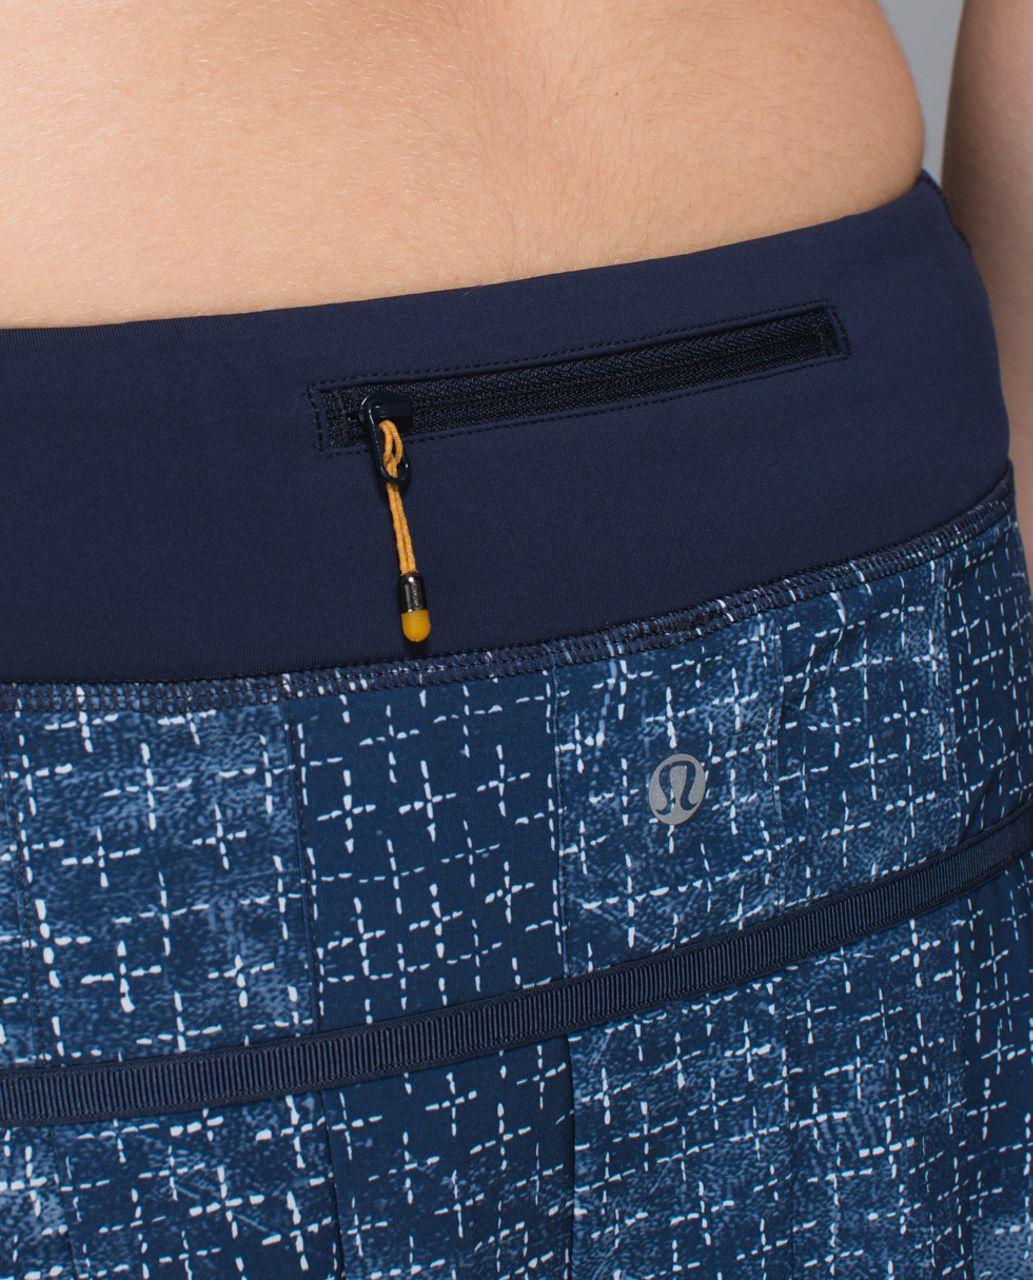 Lululemon Run:  Pace Setter Skirt *4-way Stretch (Tall) - Exploded Sashiko Cross Inkwell Ghost / Inkwell